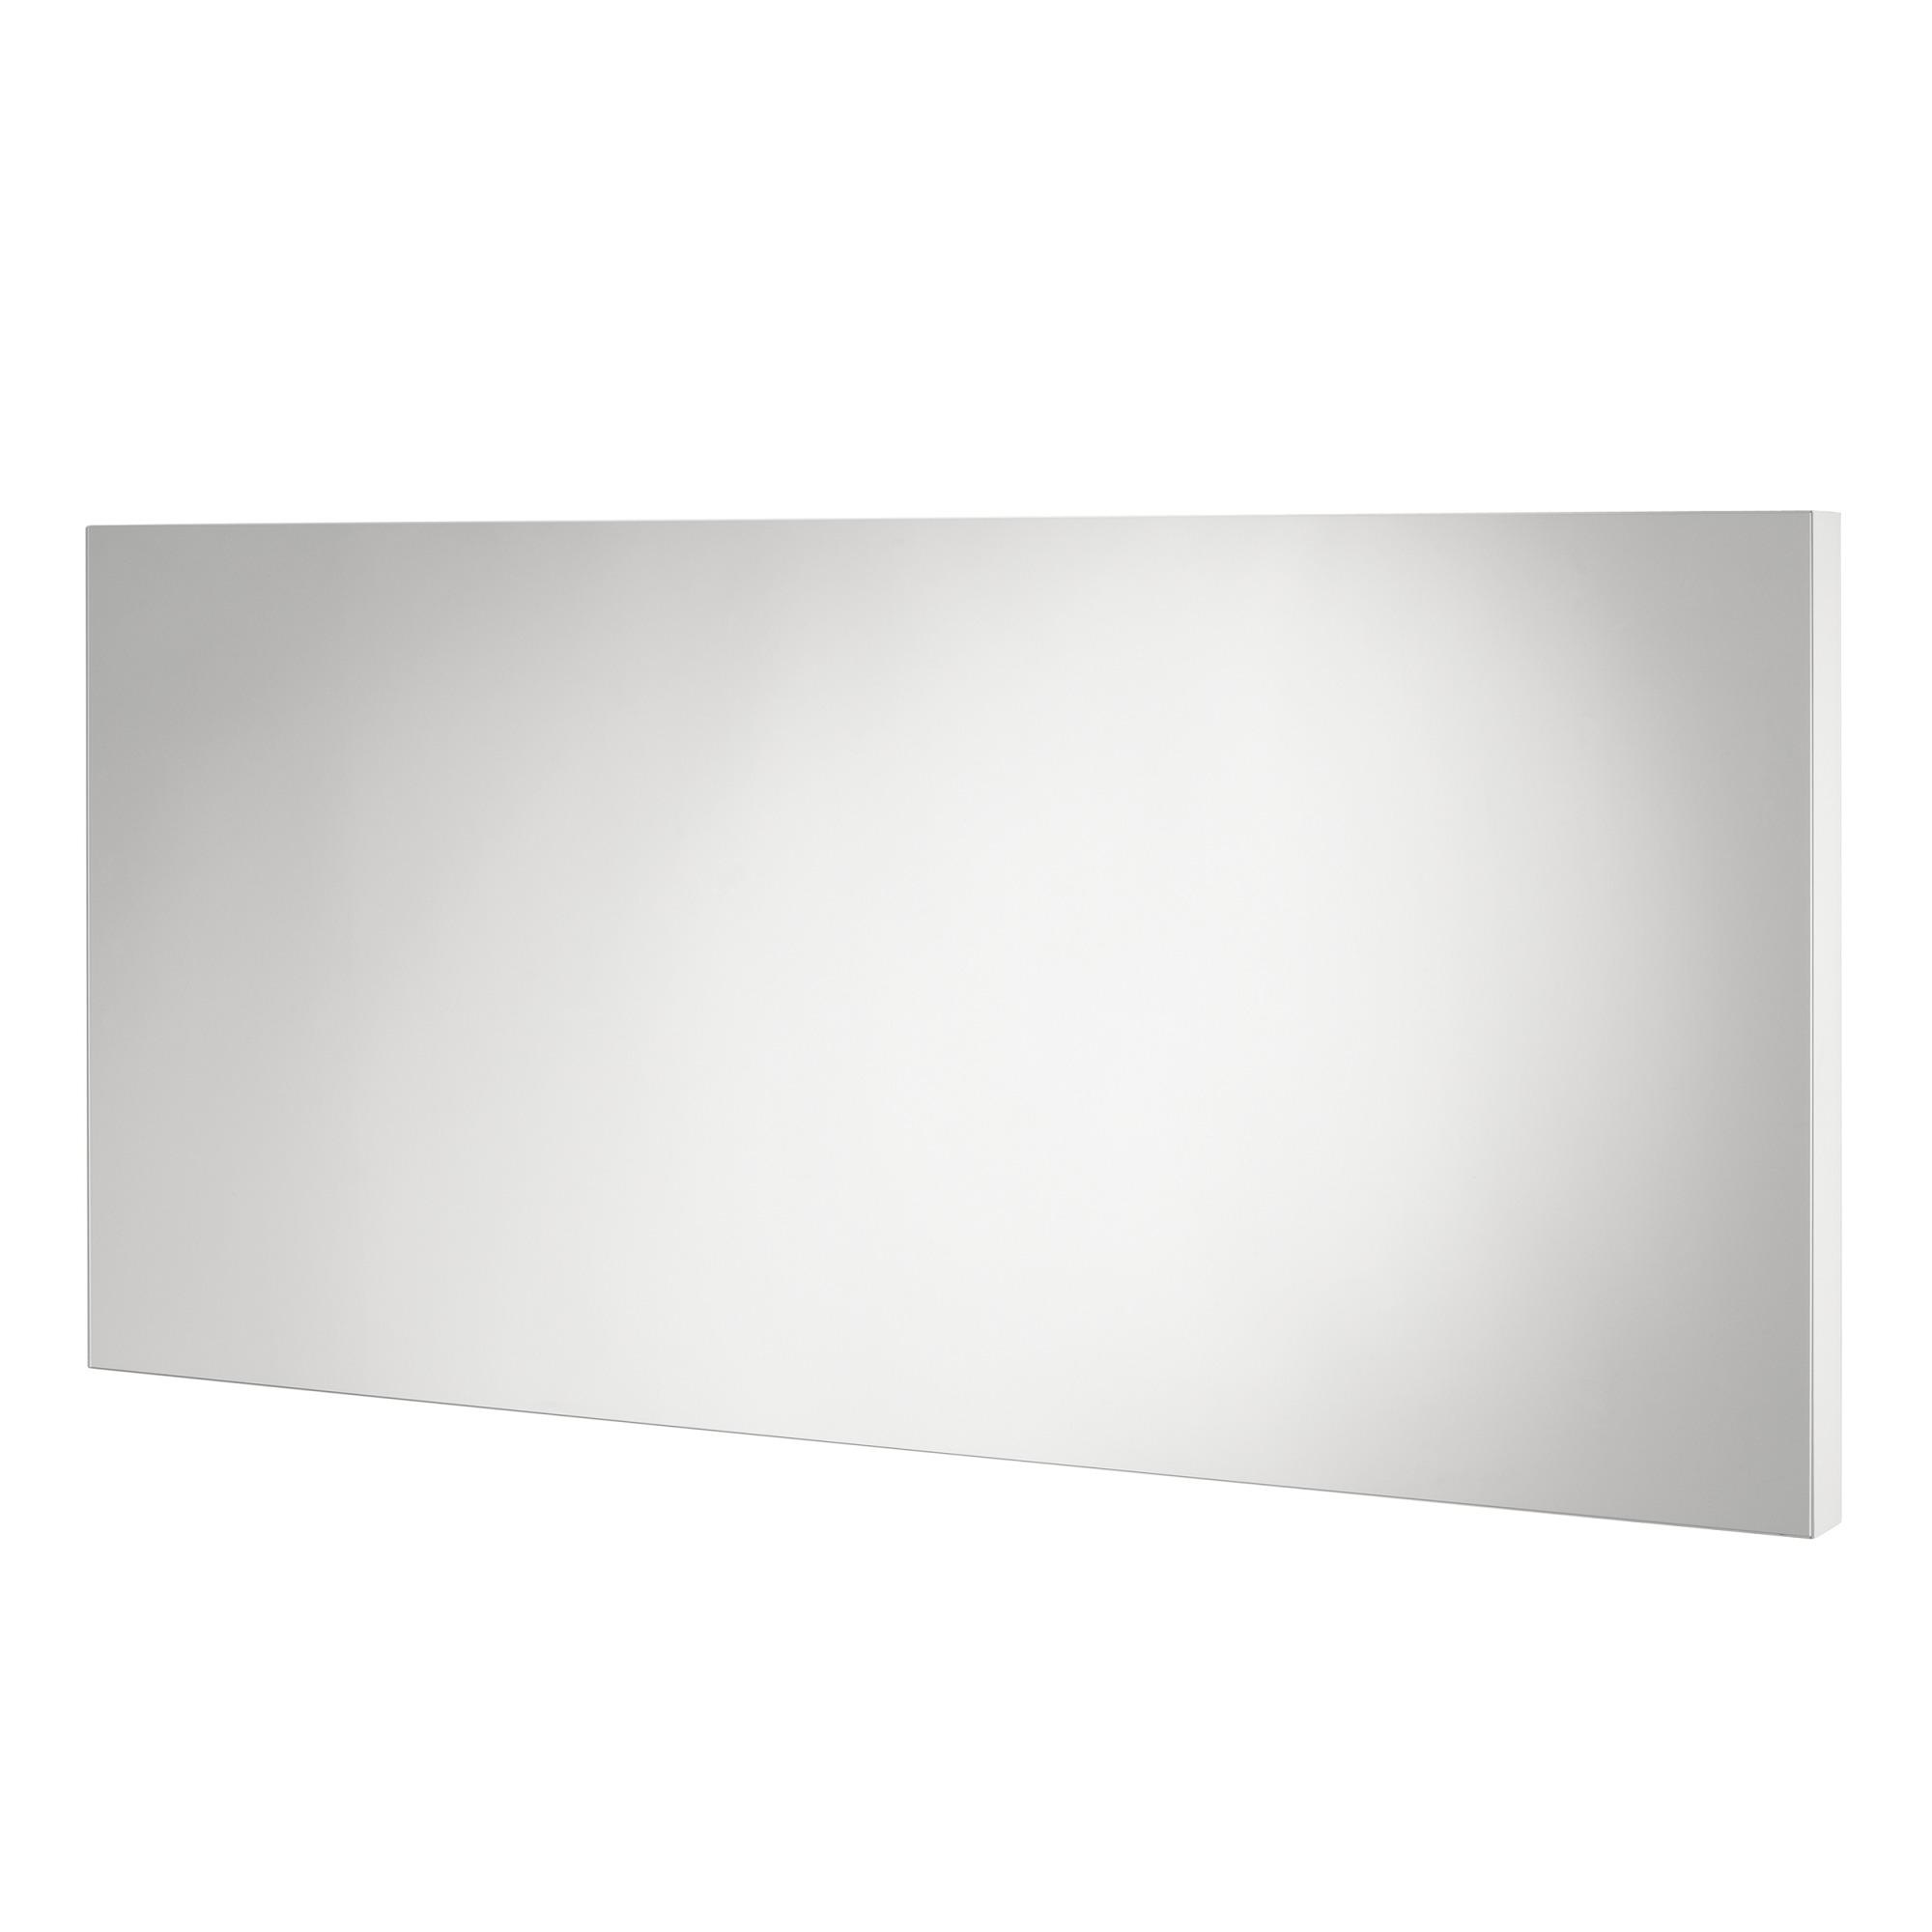 Tiger Items spiegelpaneel 105 x 50 cm, wit hoogglans